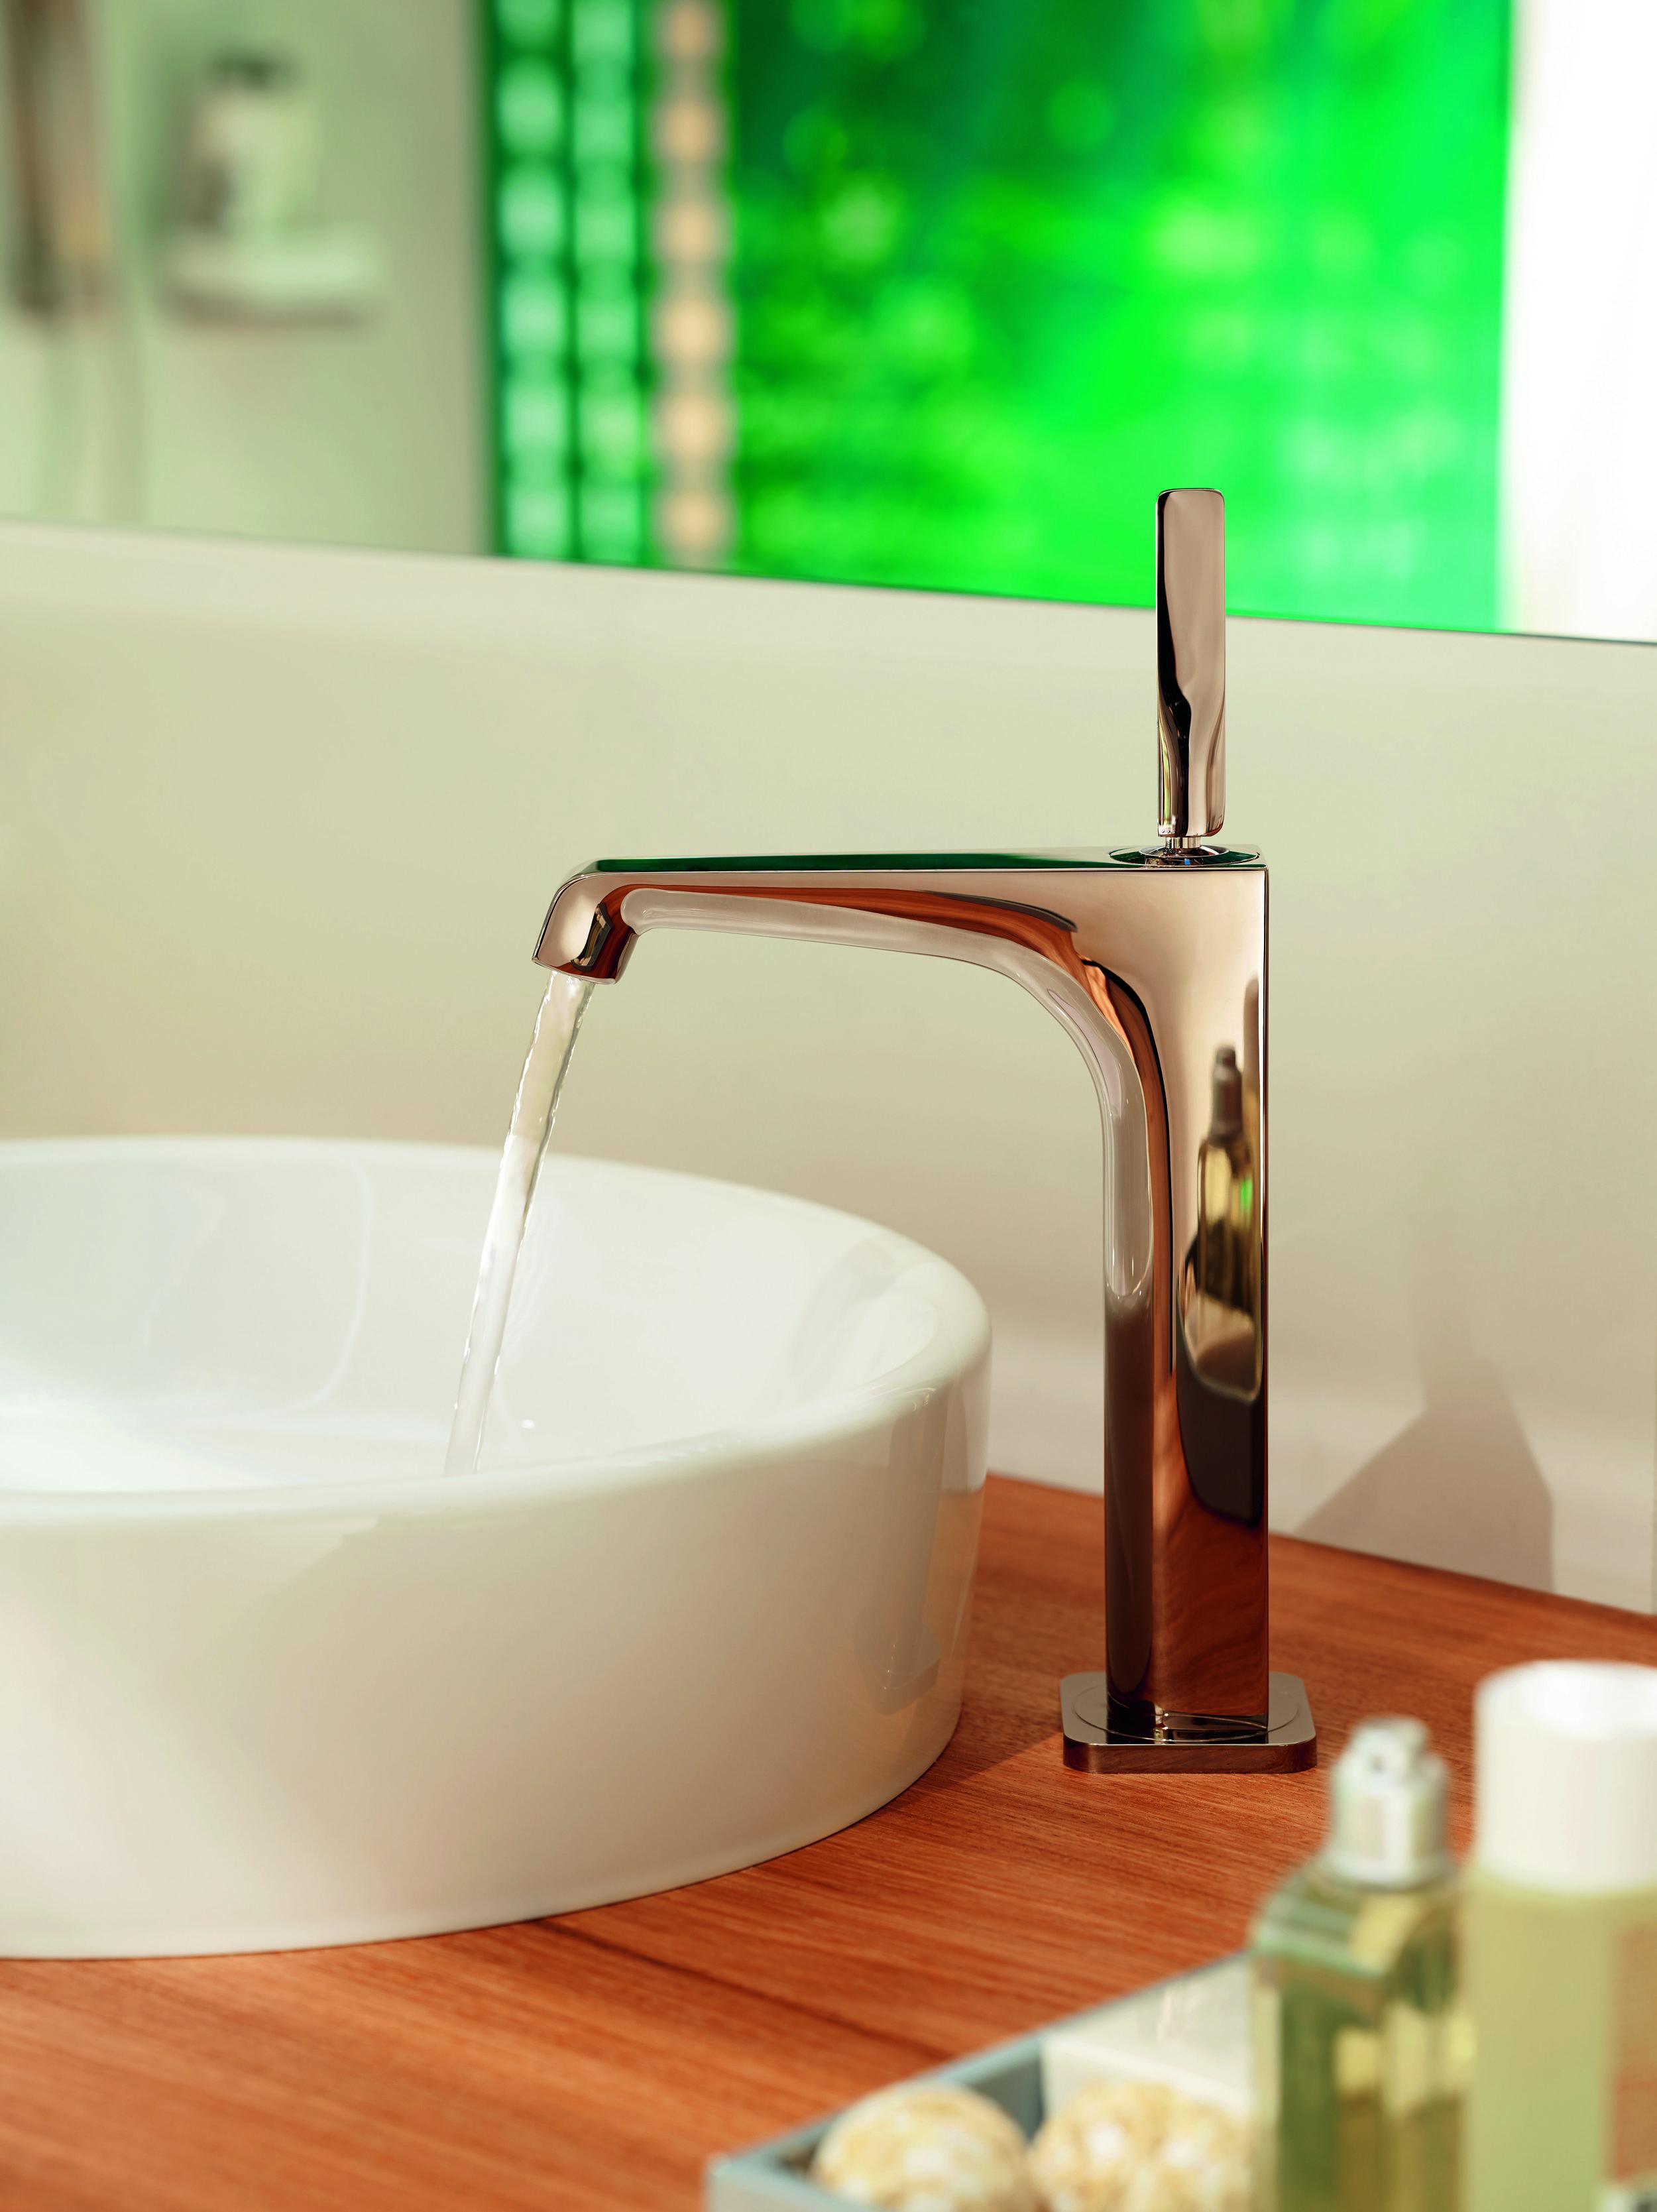 AXOR_Citterio_E_Single-Hole Faucet, Medium_Polished red gold.jpg